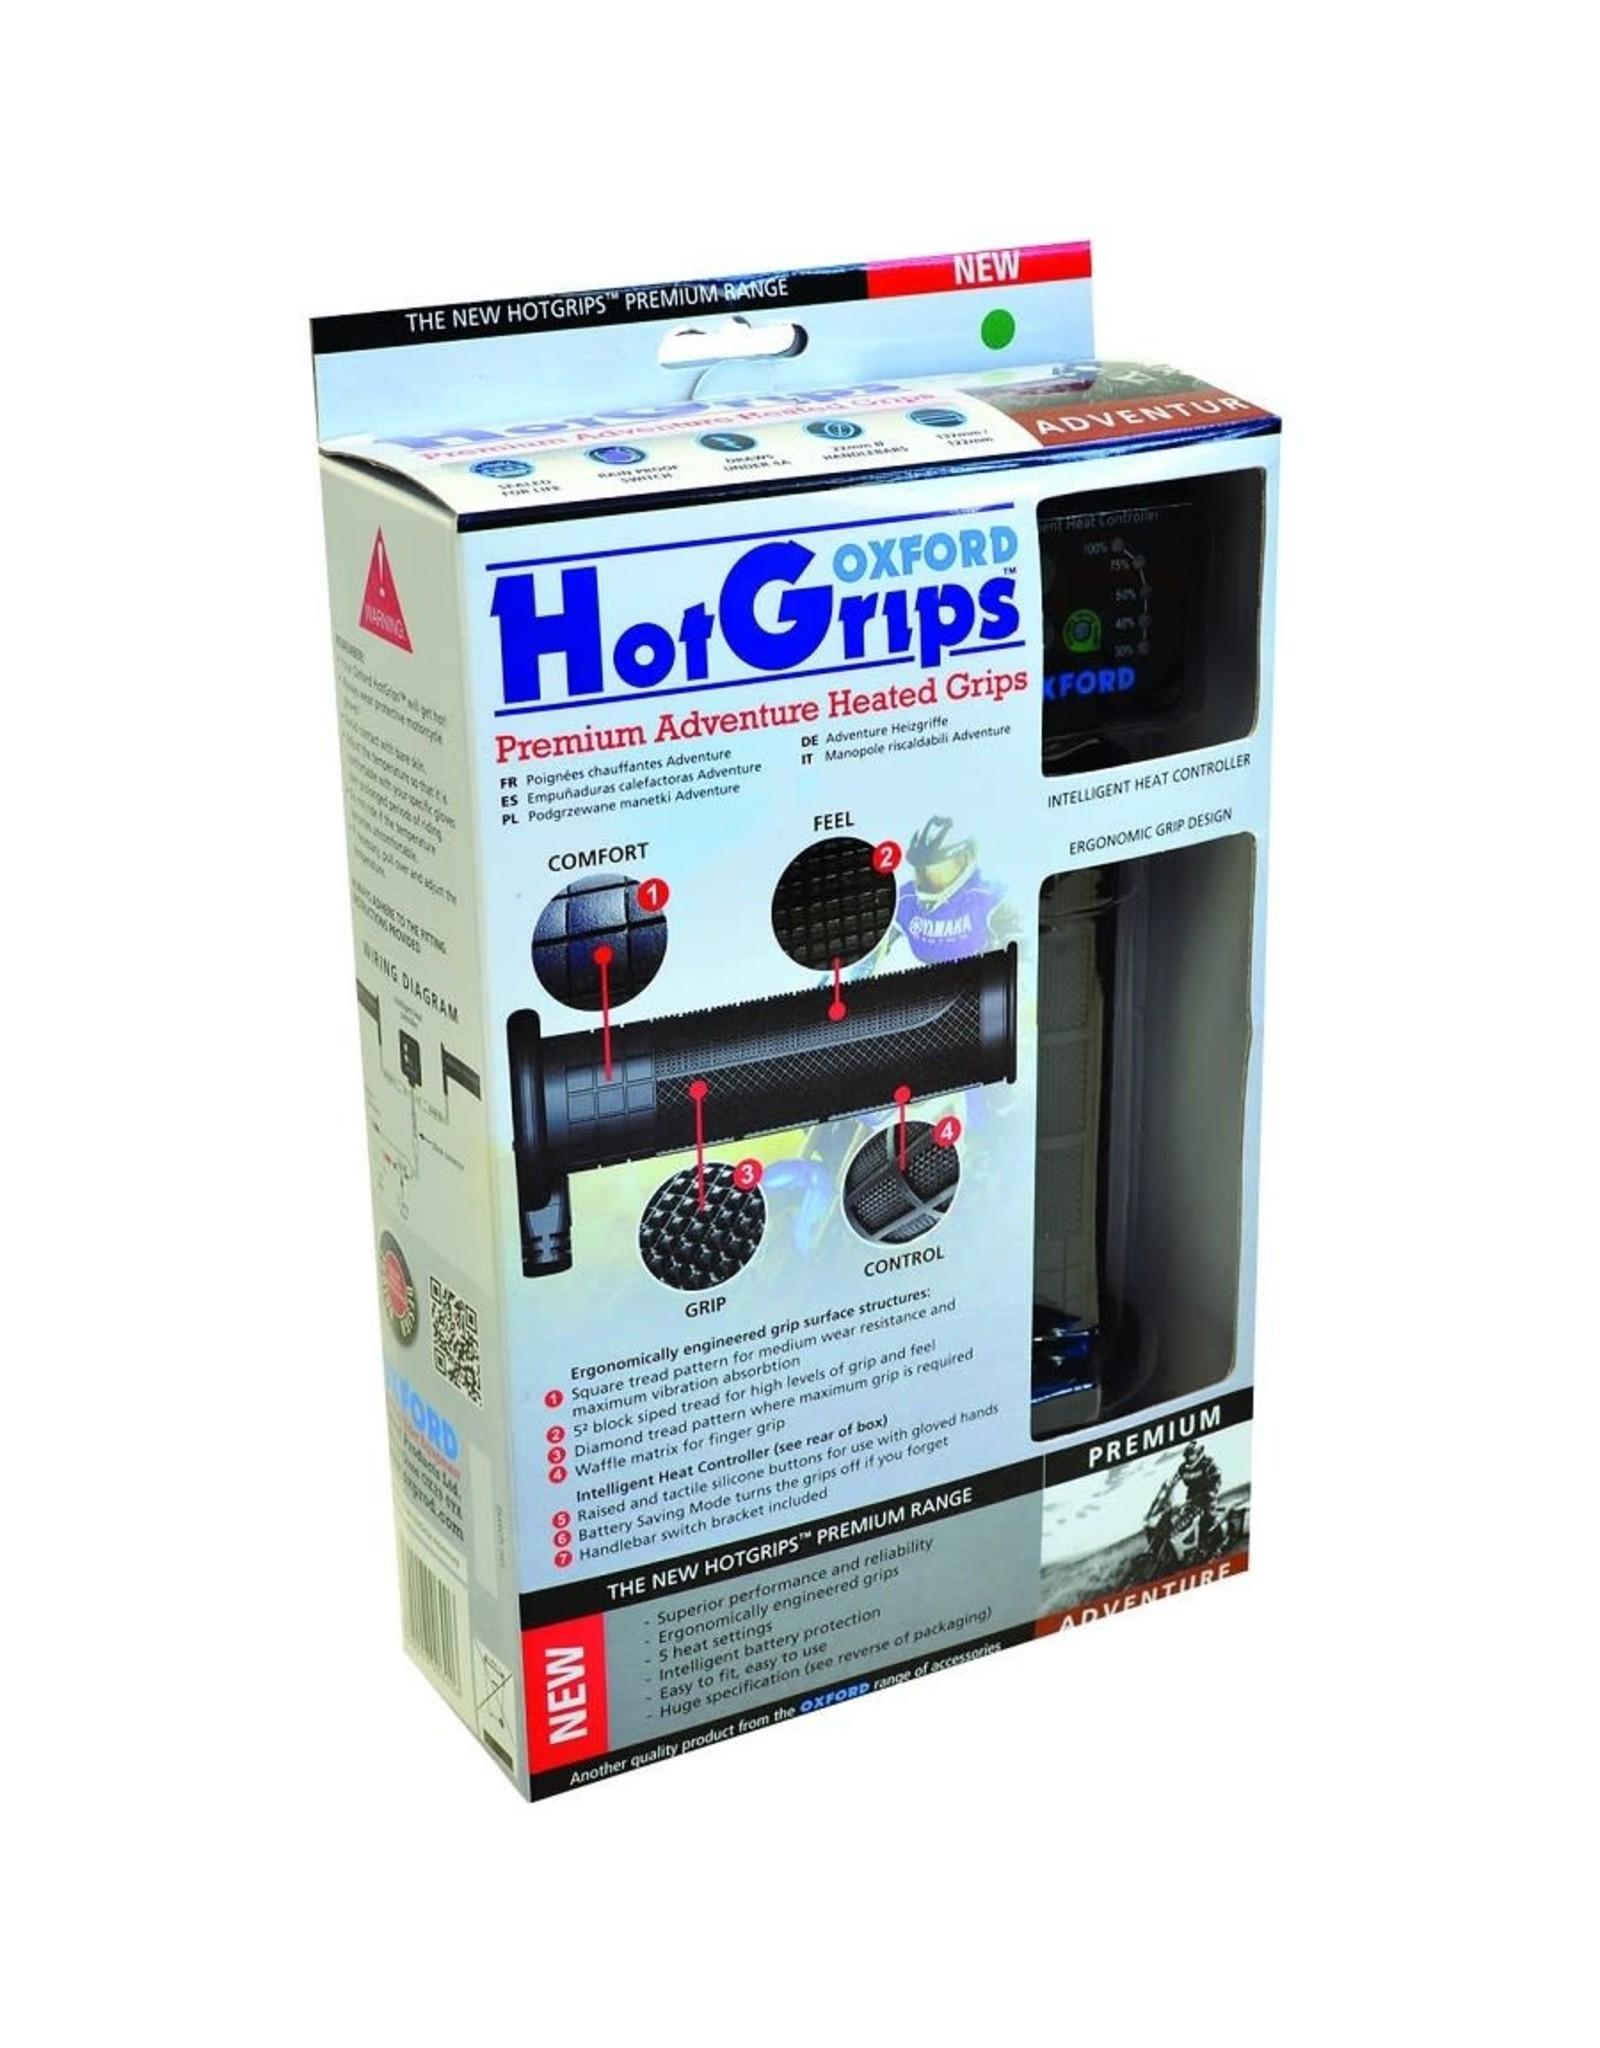 Oxford Hotgrips Premium model Adventure